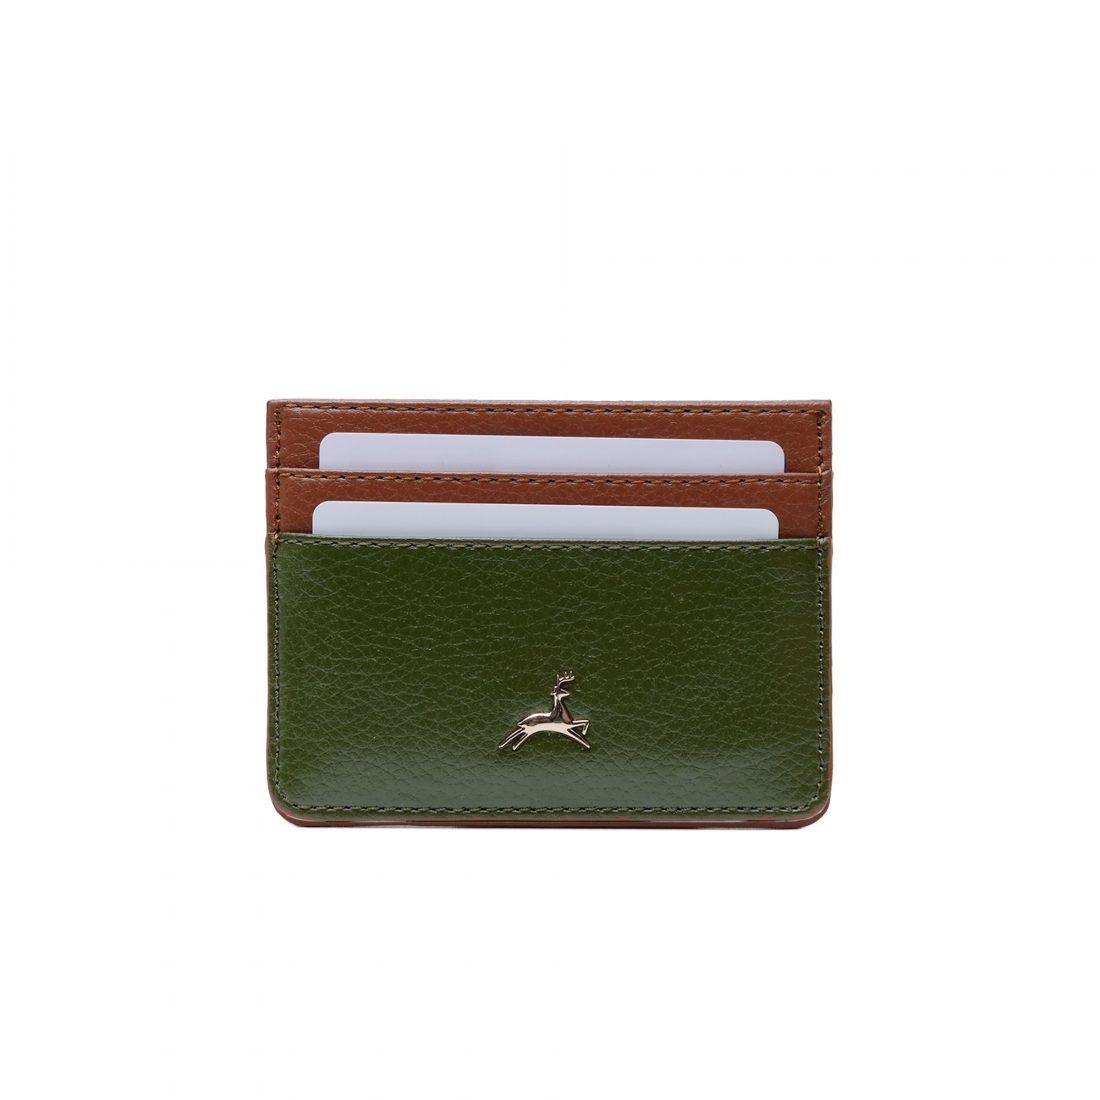 Bira-card-wallet-green-brown-1